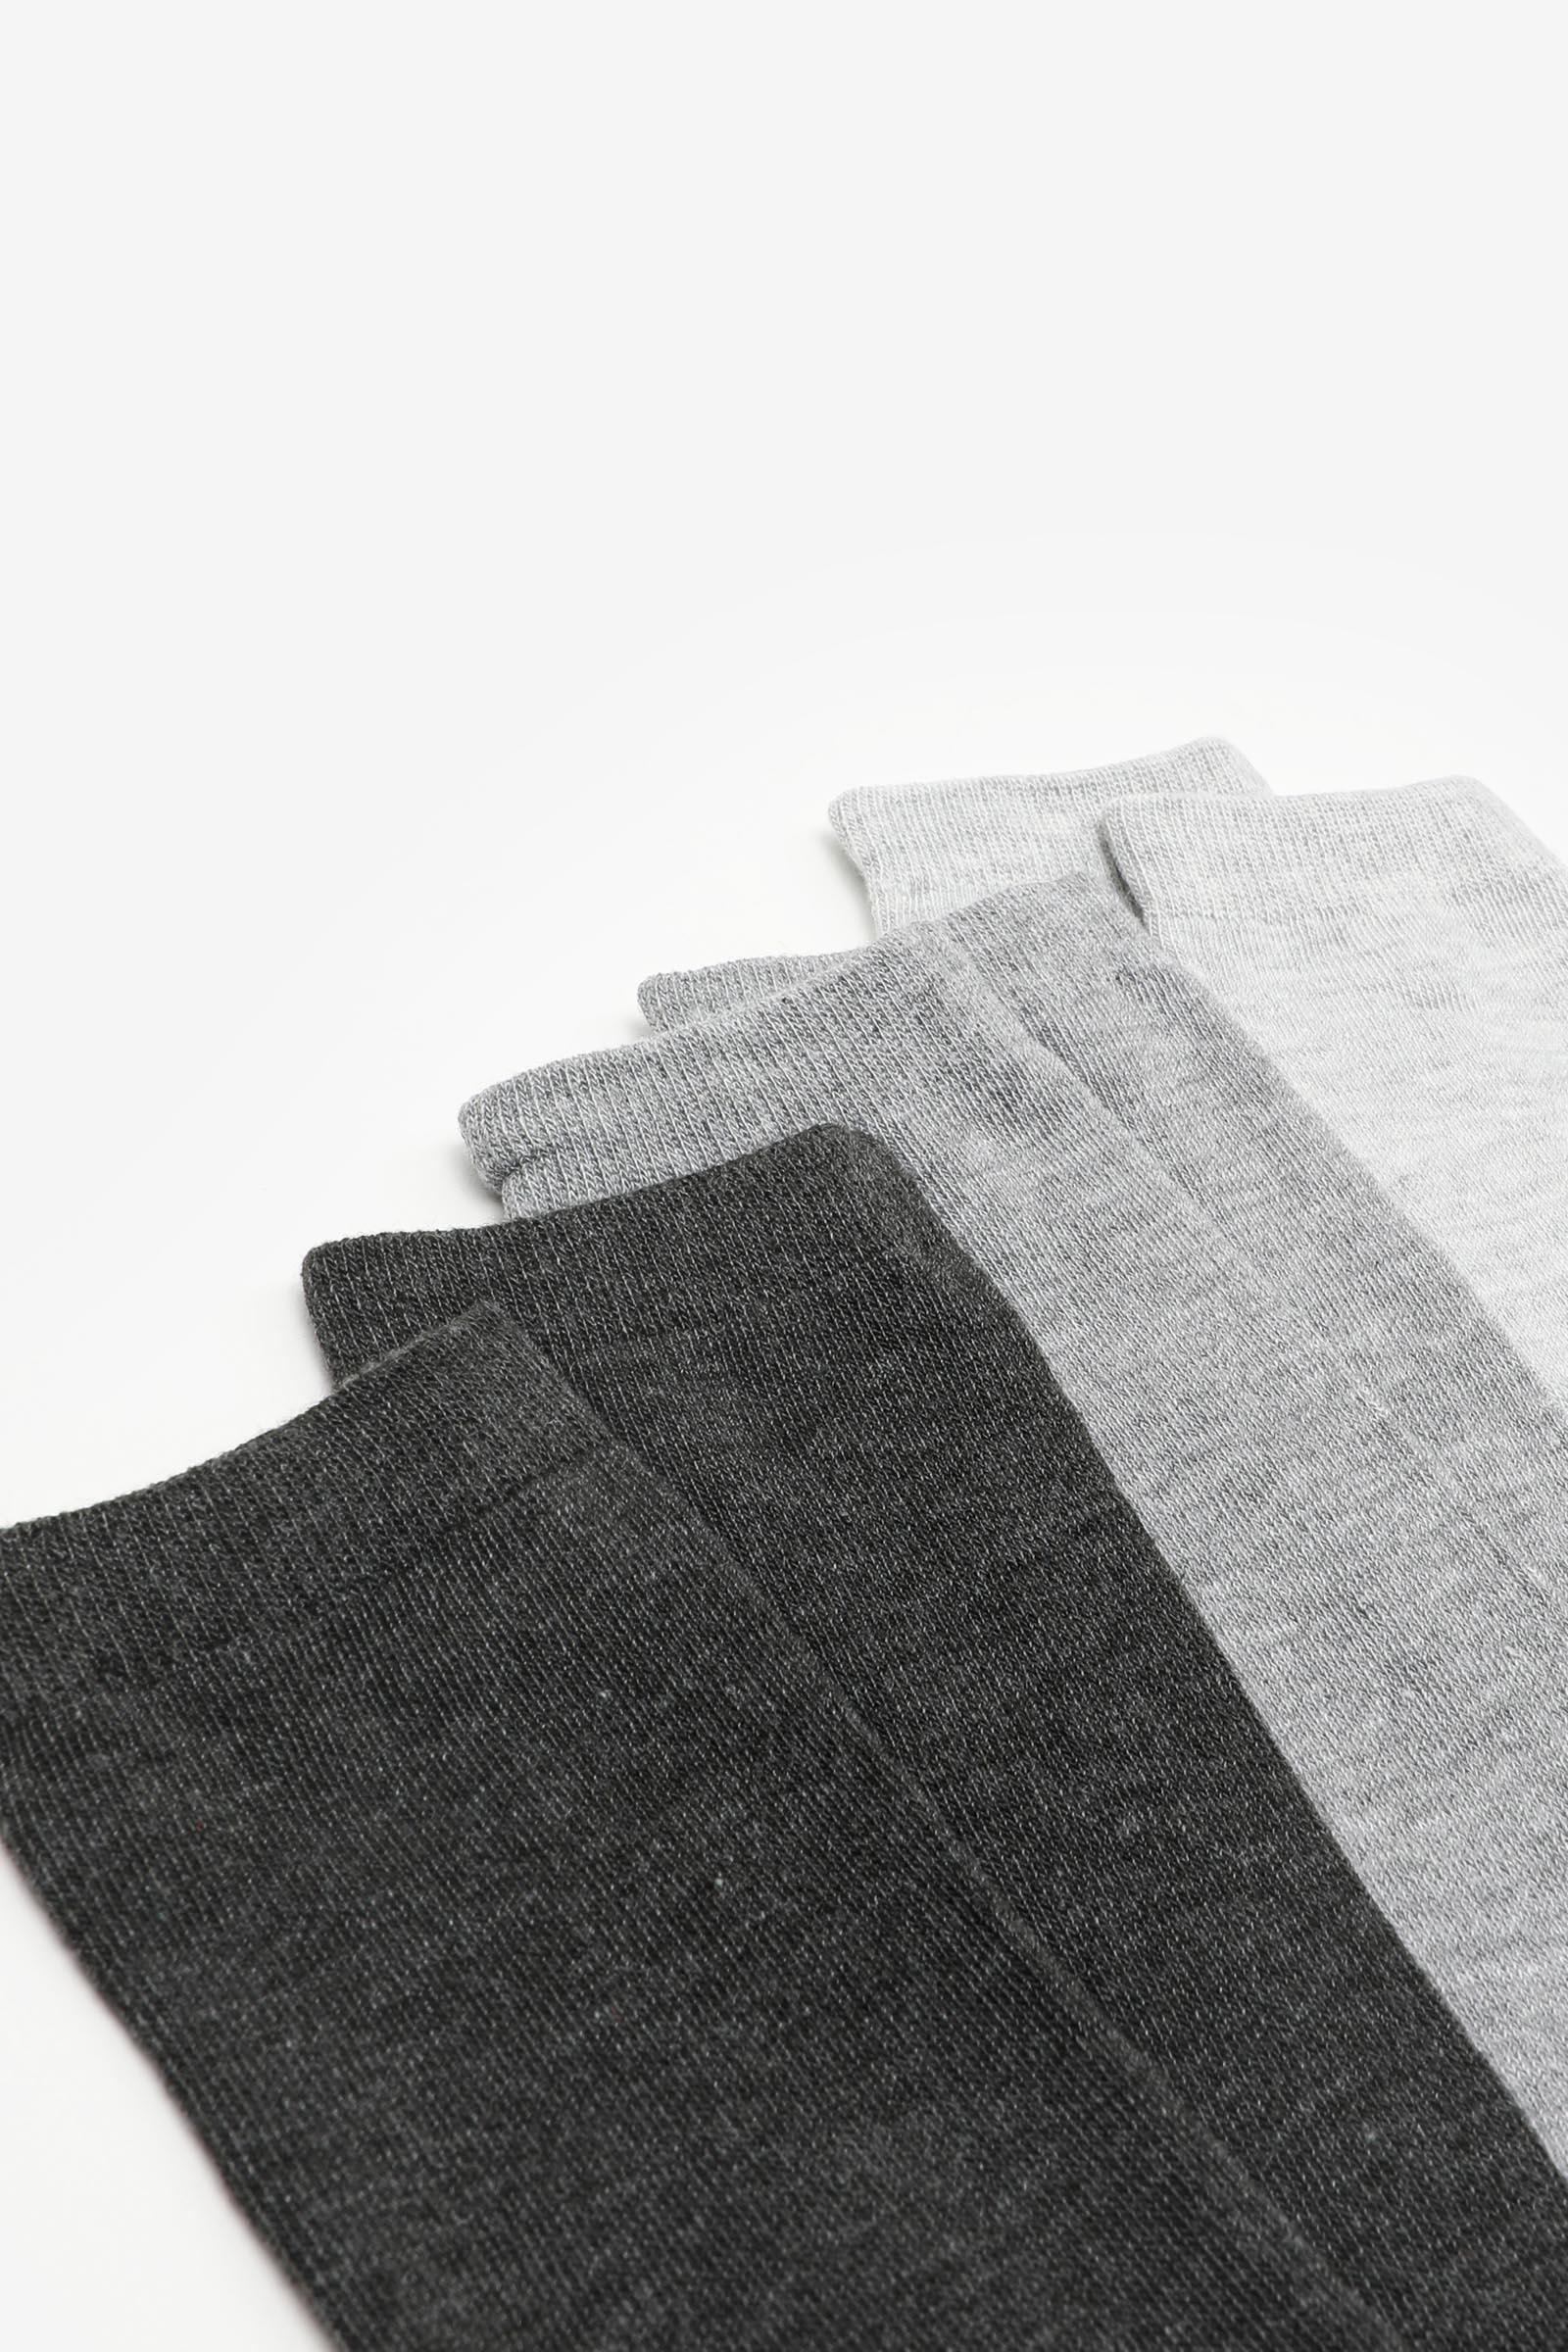 3 Pairs of Crew Socks